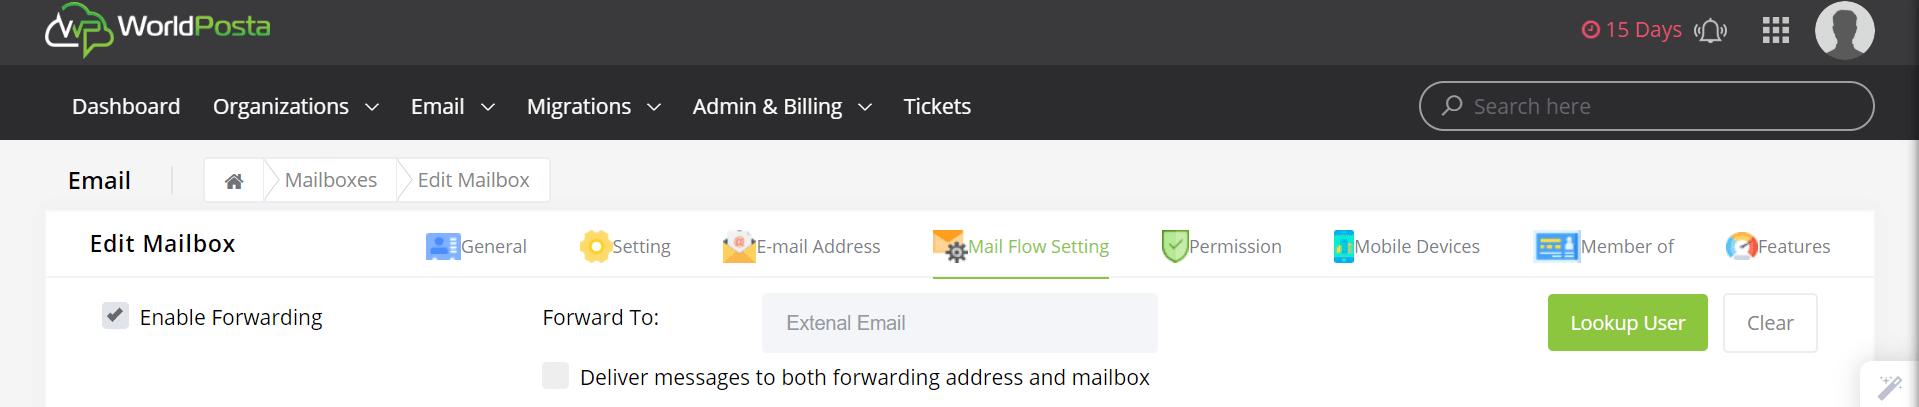 enable forwarding - Configuring Email Forwarding